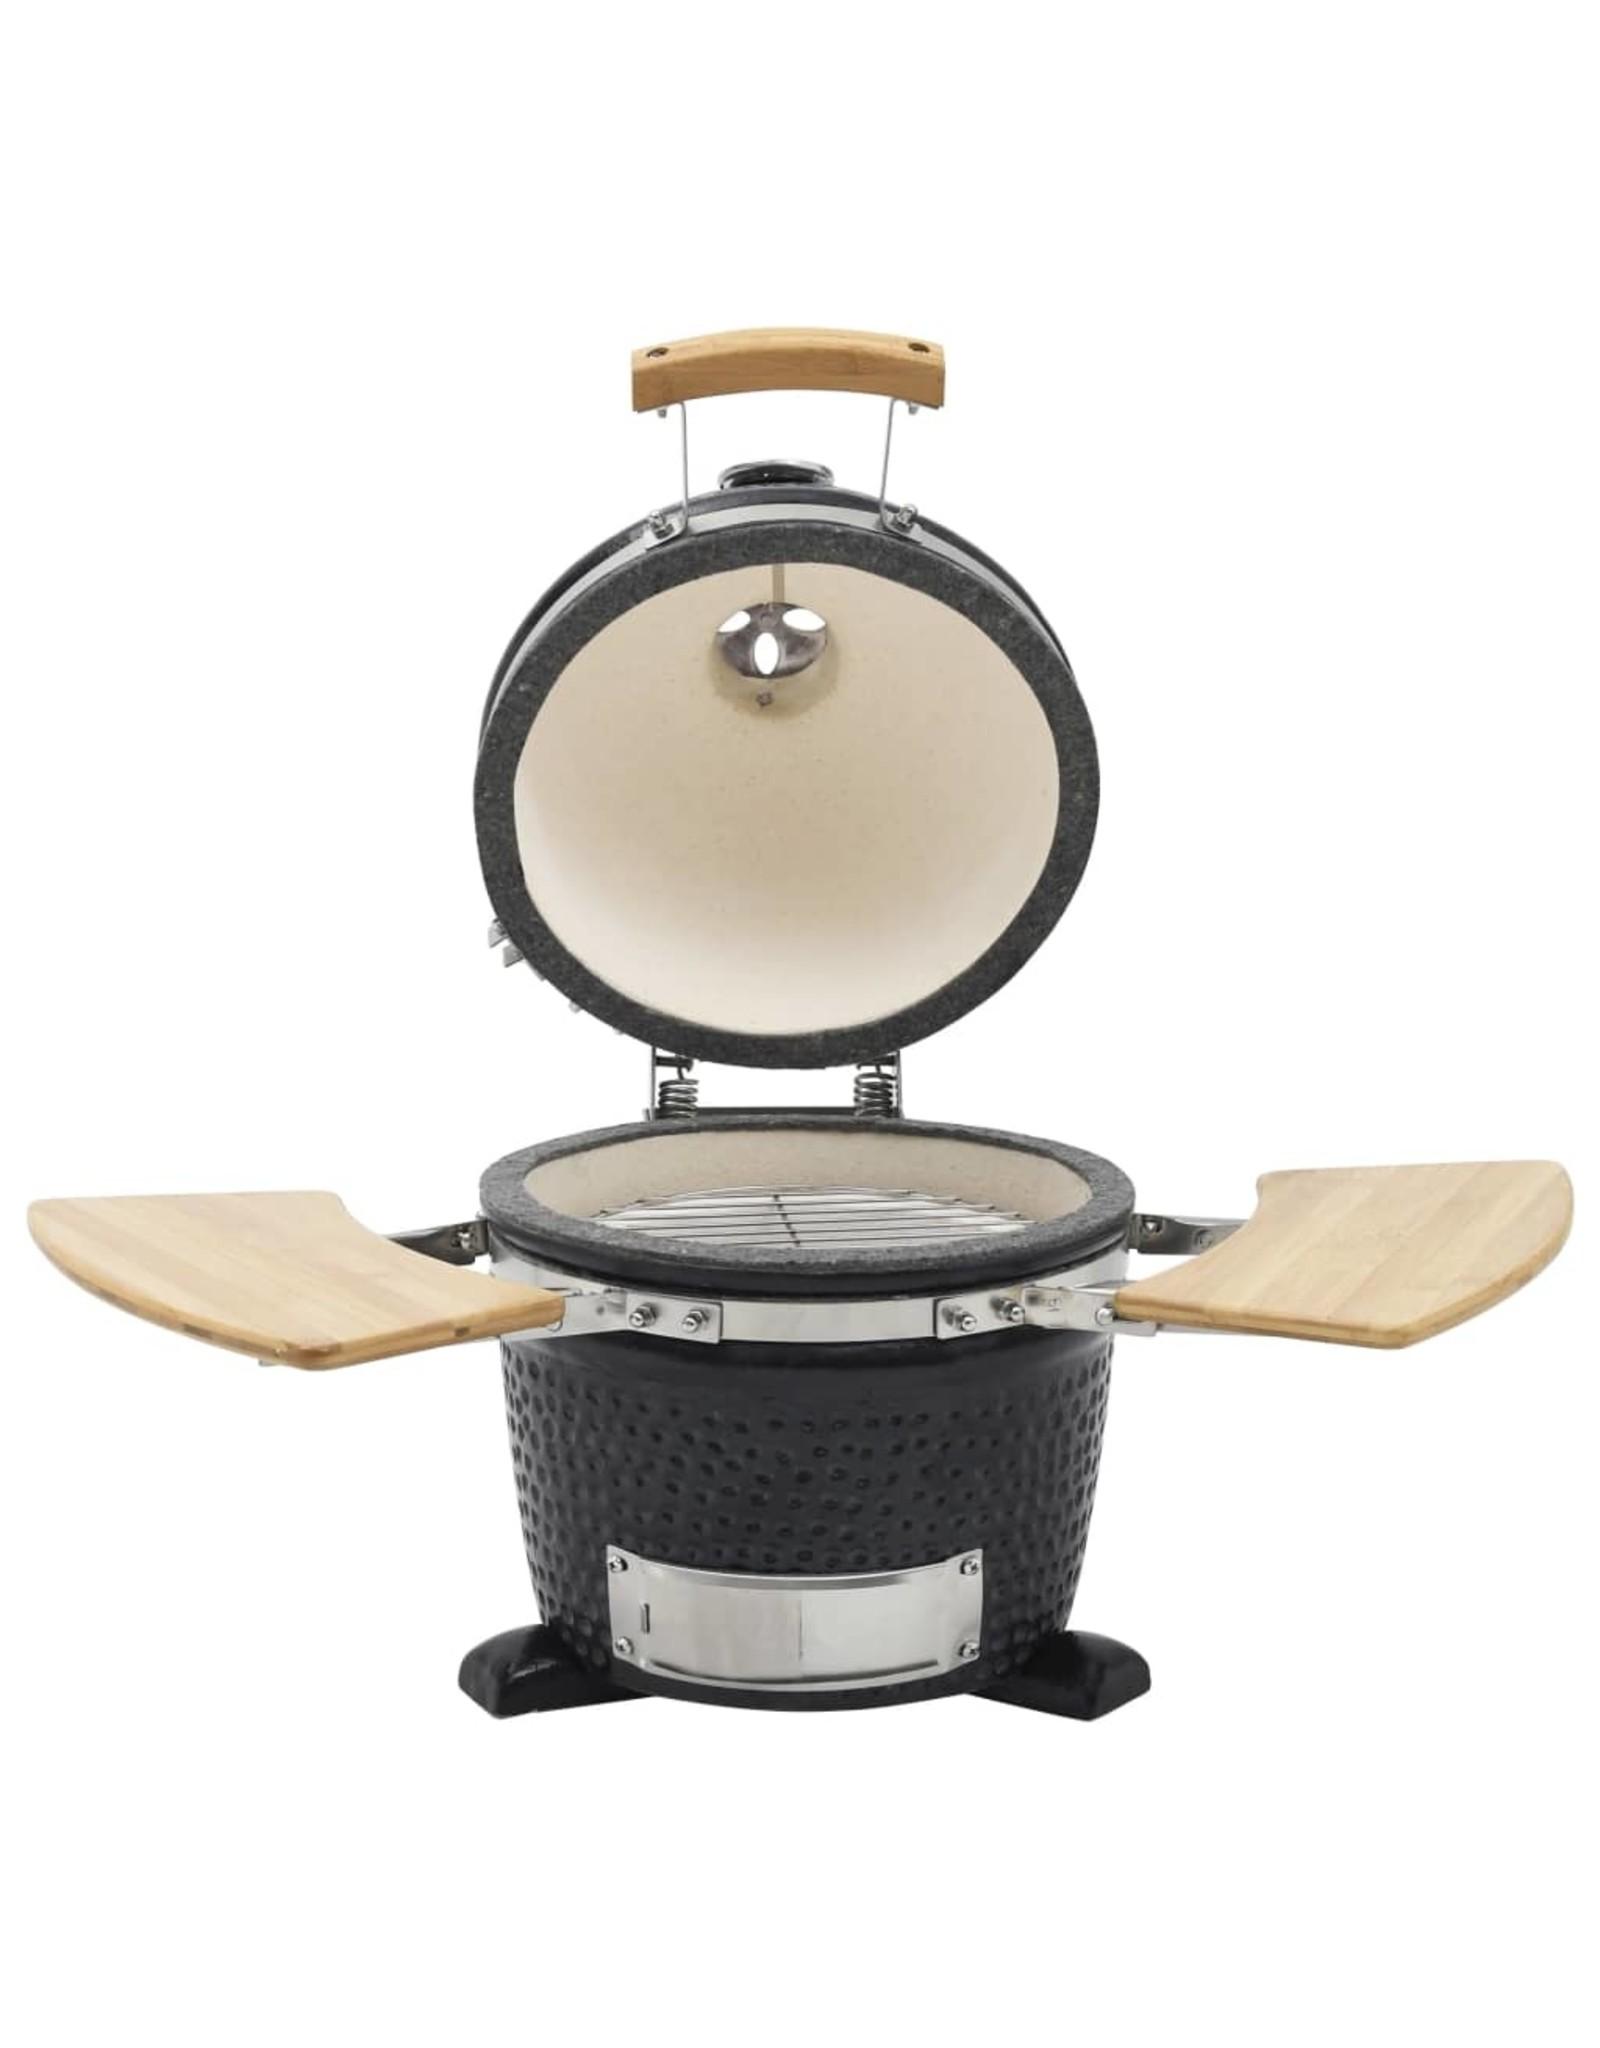 Kamado barbecue grill smoker keramisch 44 cm